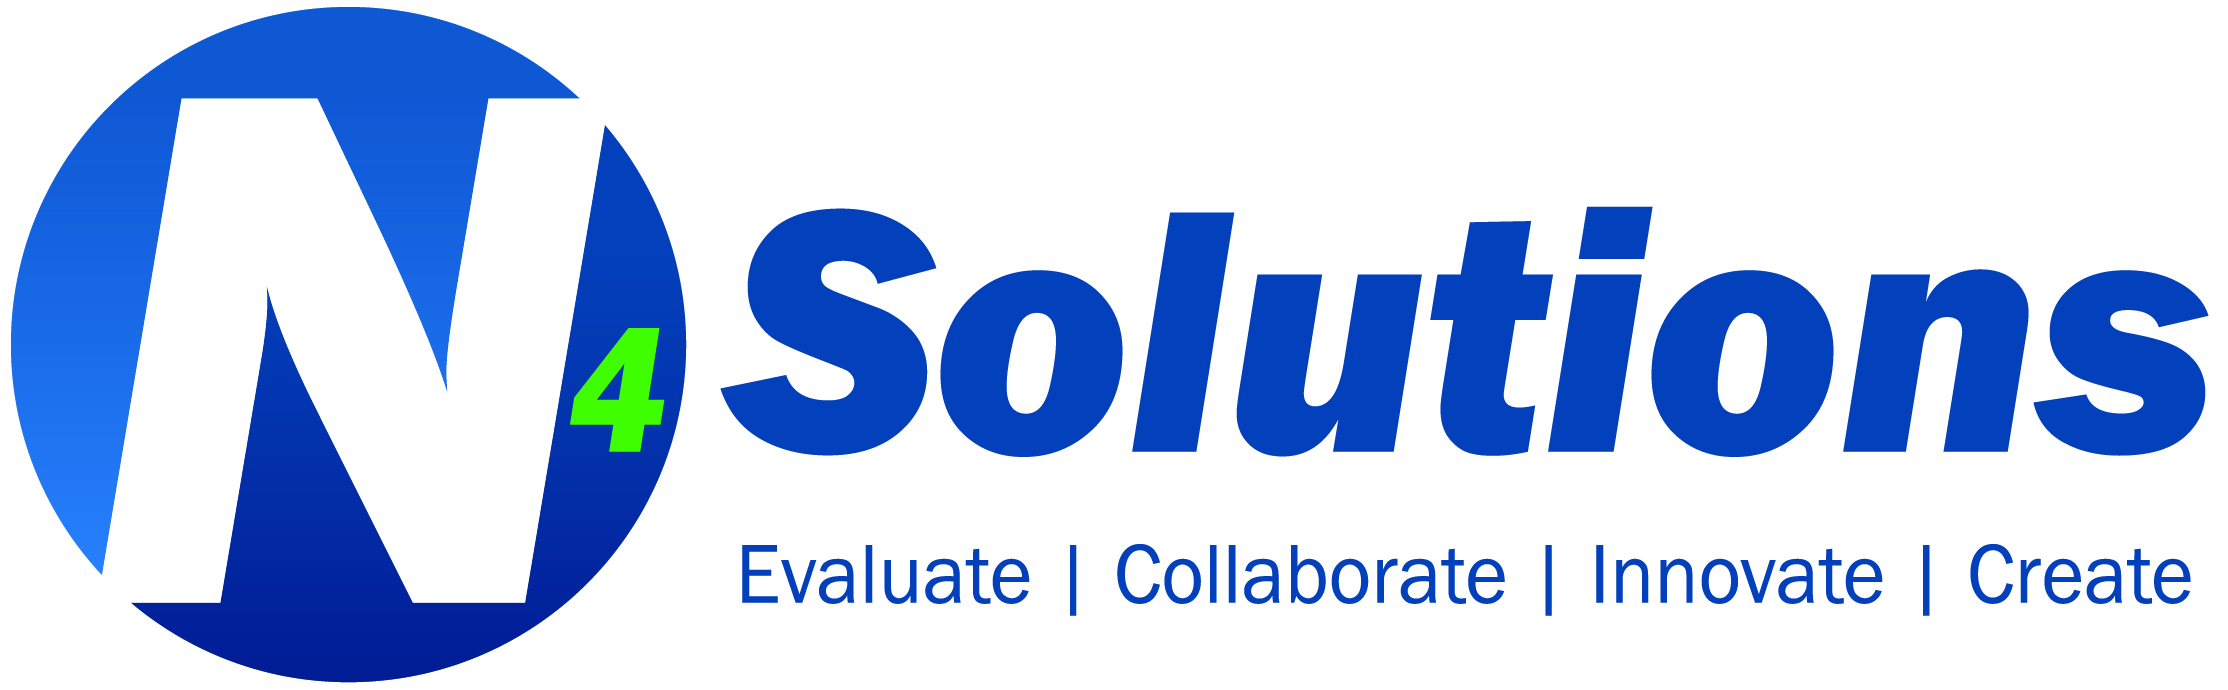 N4 Solutions logo CMYK_blue